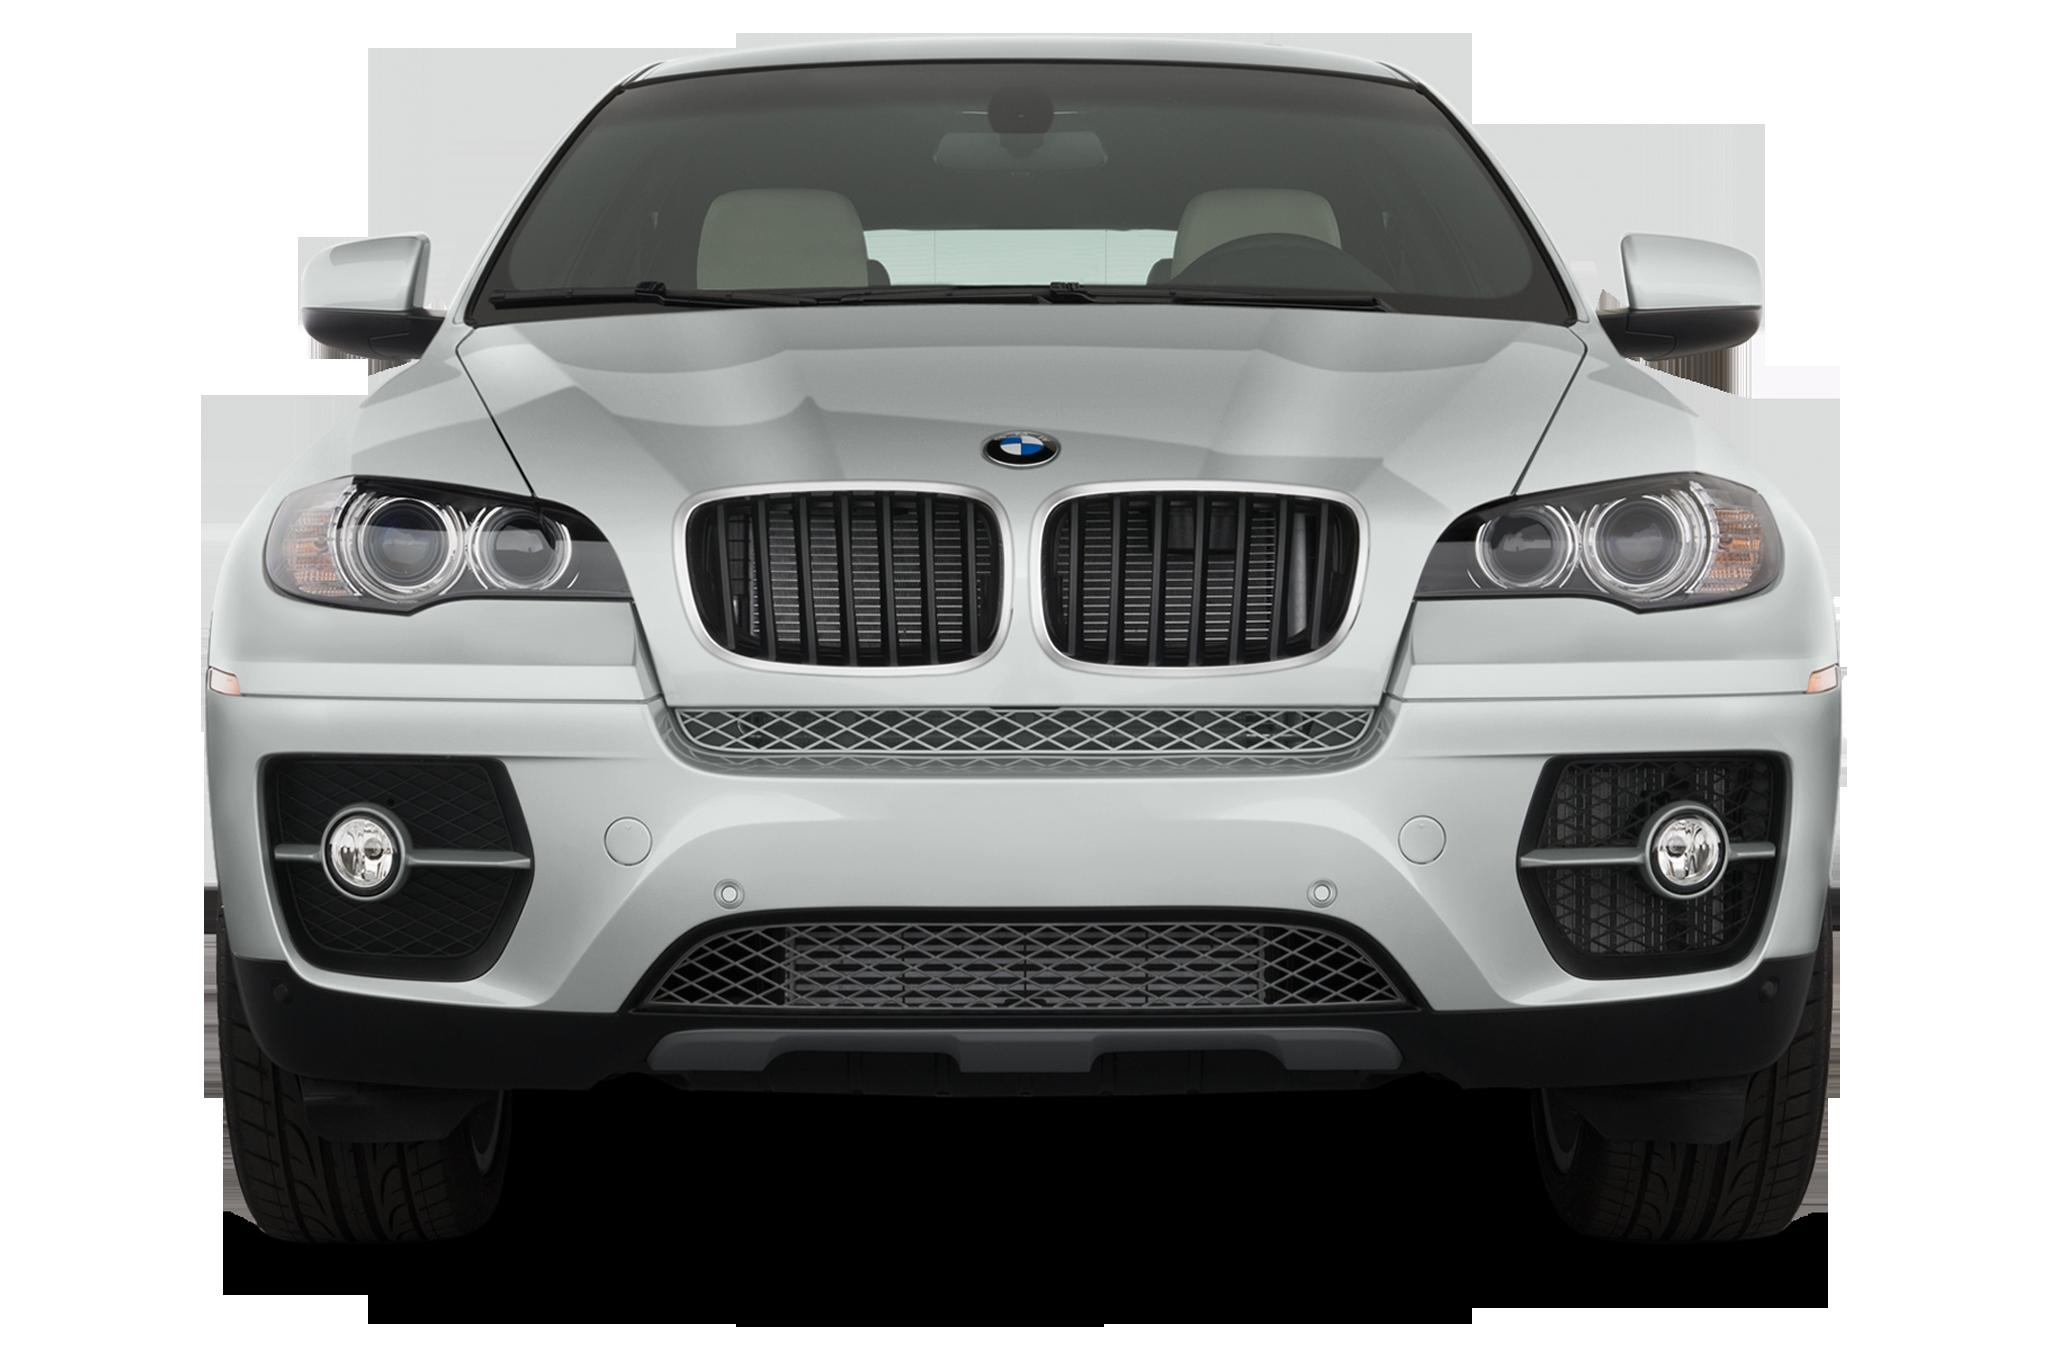 BMW X6 M I (E71) 2009 - 2012 SUV 5 door #5